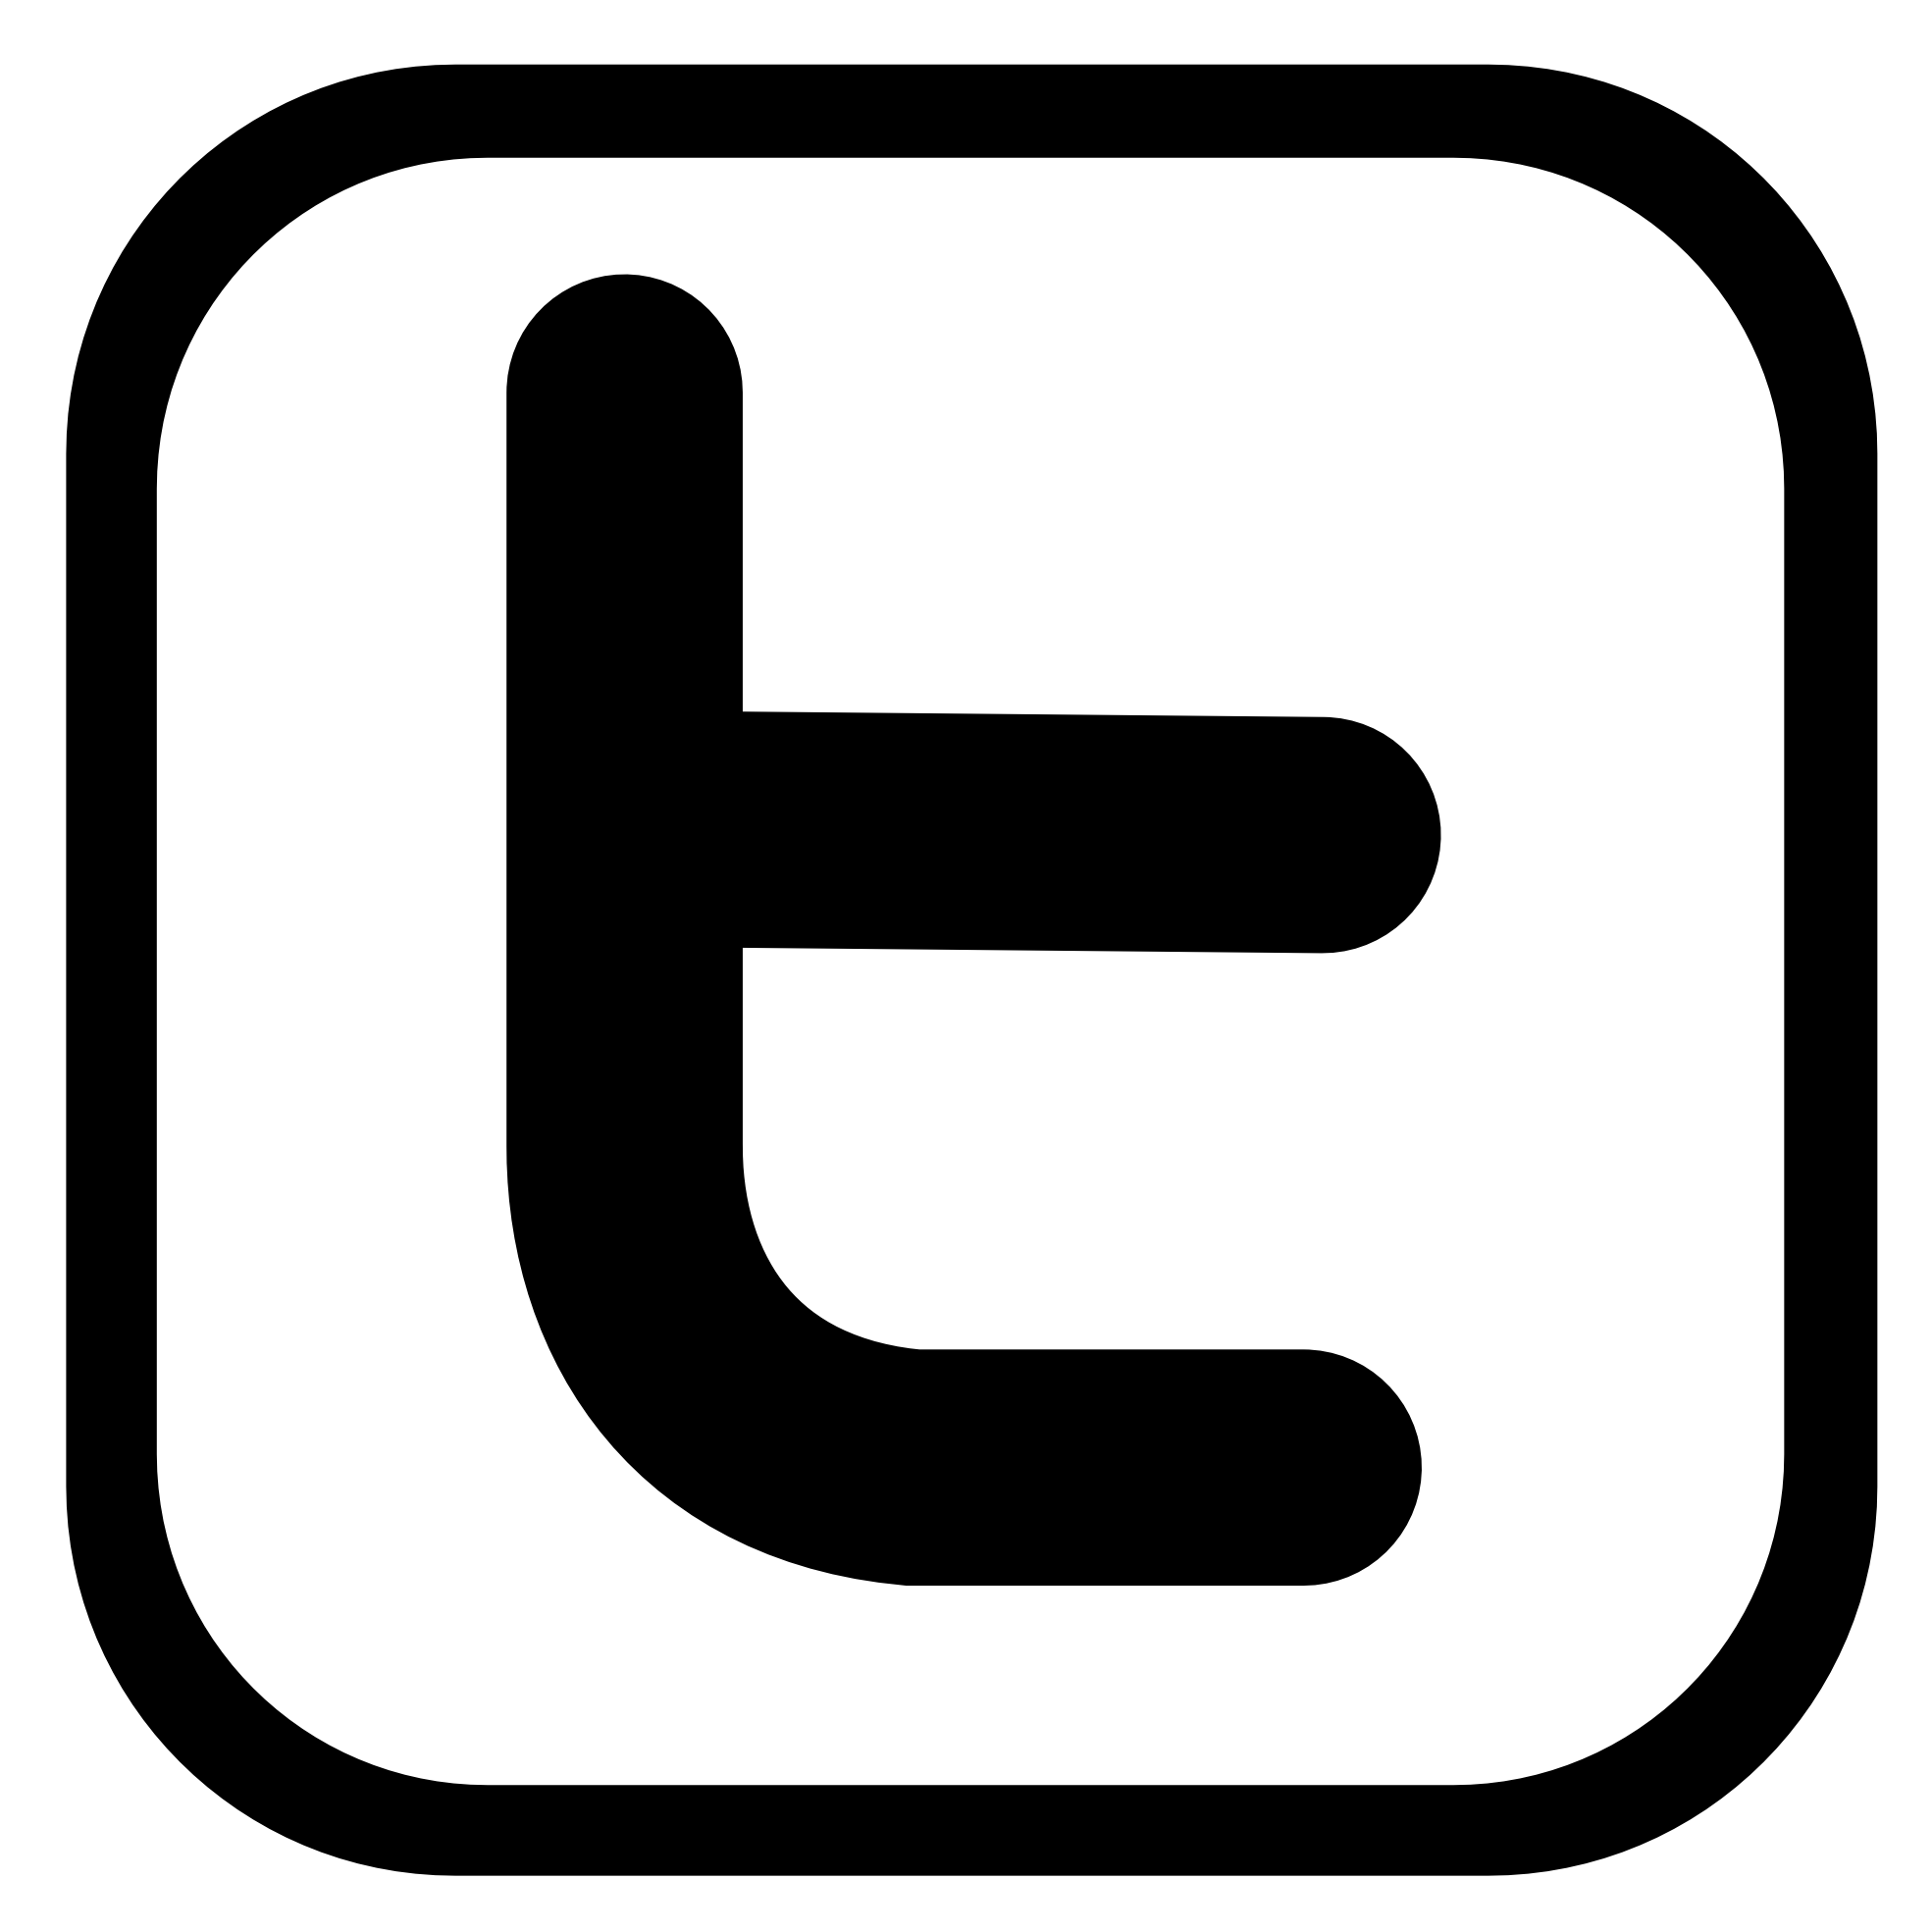 14 vector twitter logo transparent background images